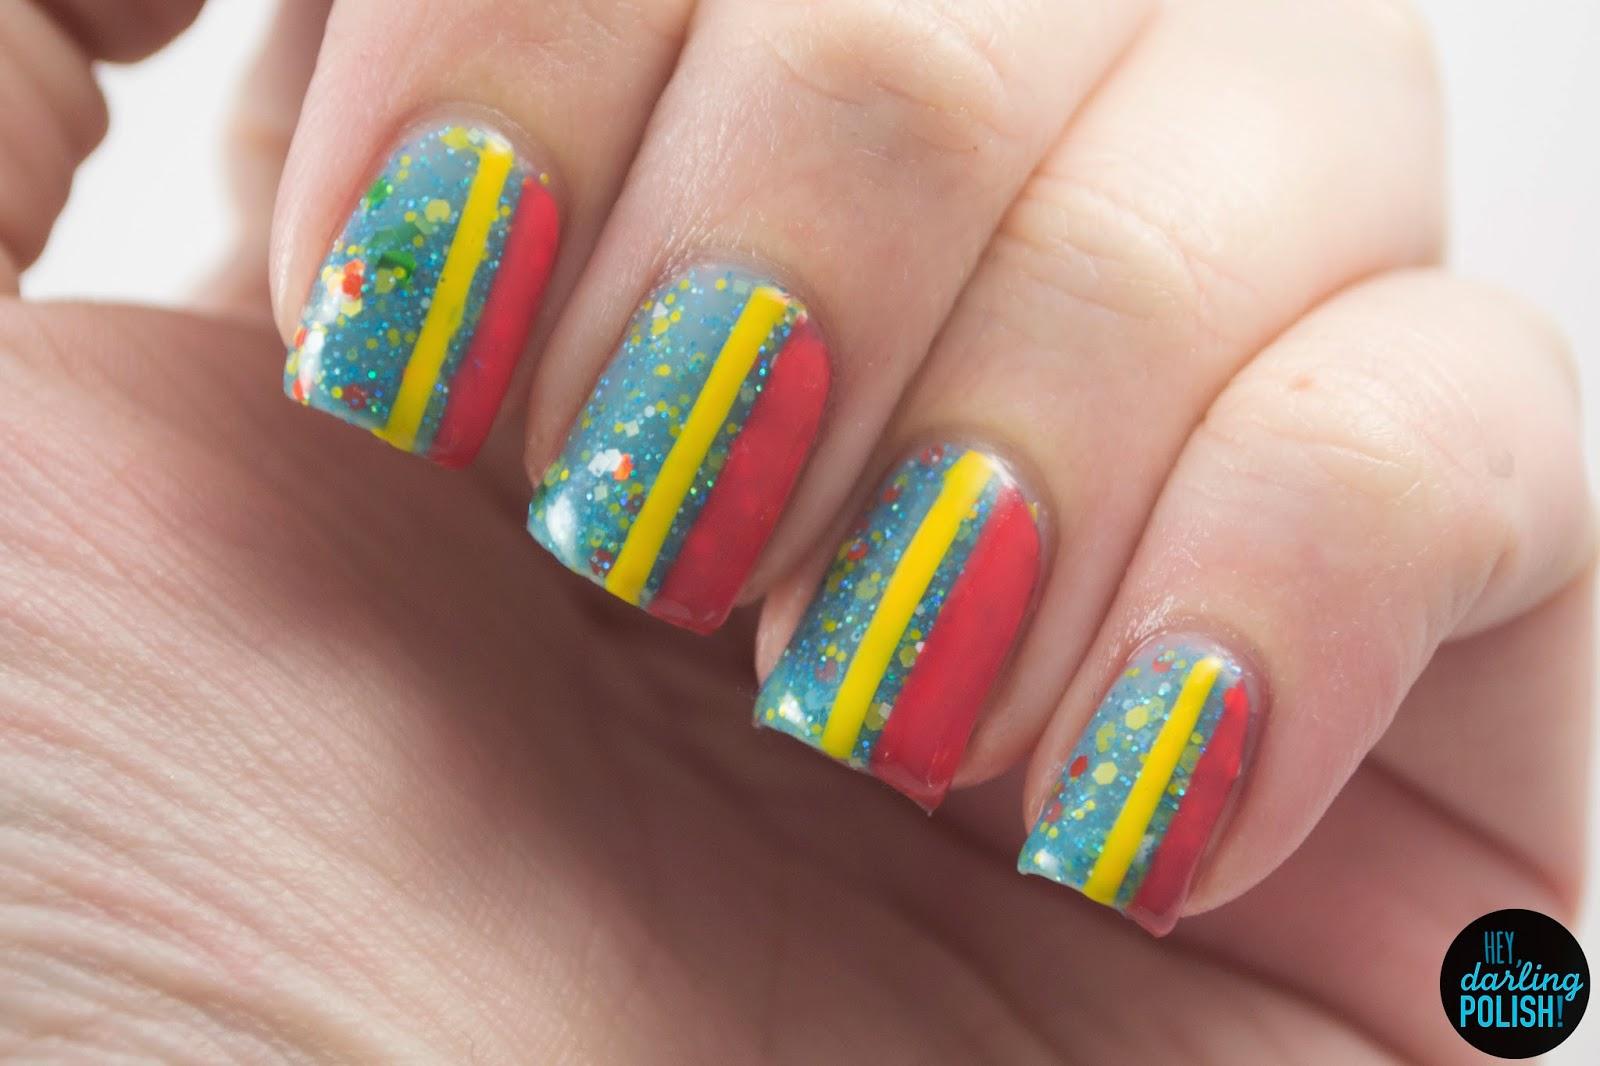 nails, nail art, nail polish, polish, indie, indie polish, indie nail polish, digital nails, hey darling polish, the never ending pile challenge